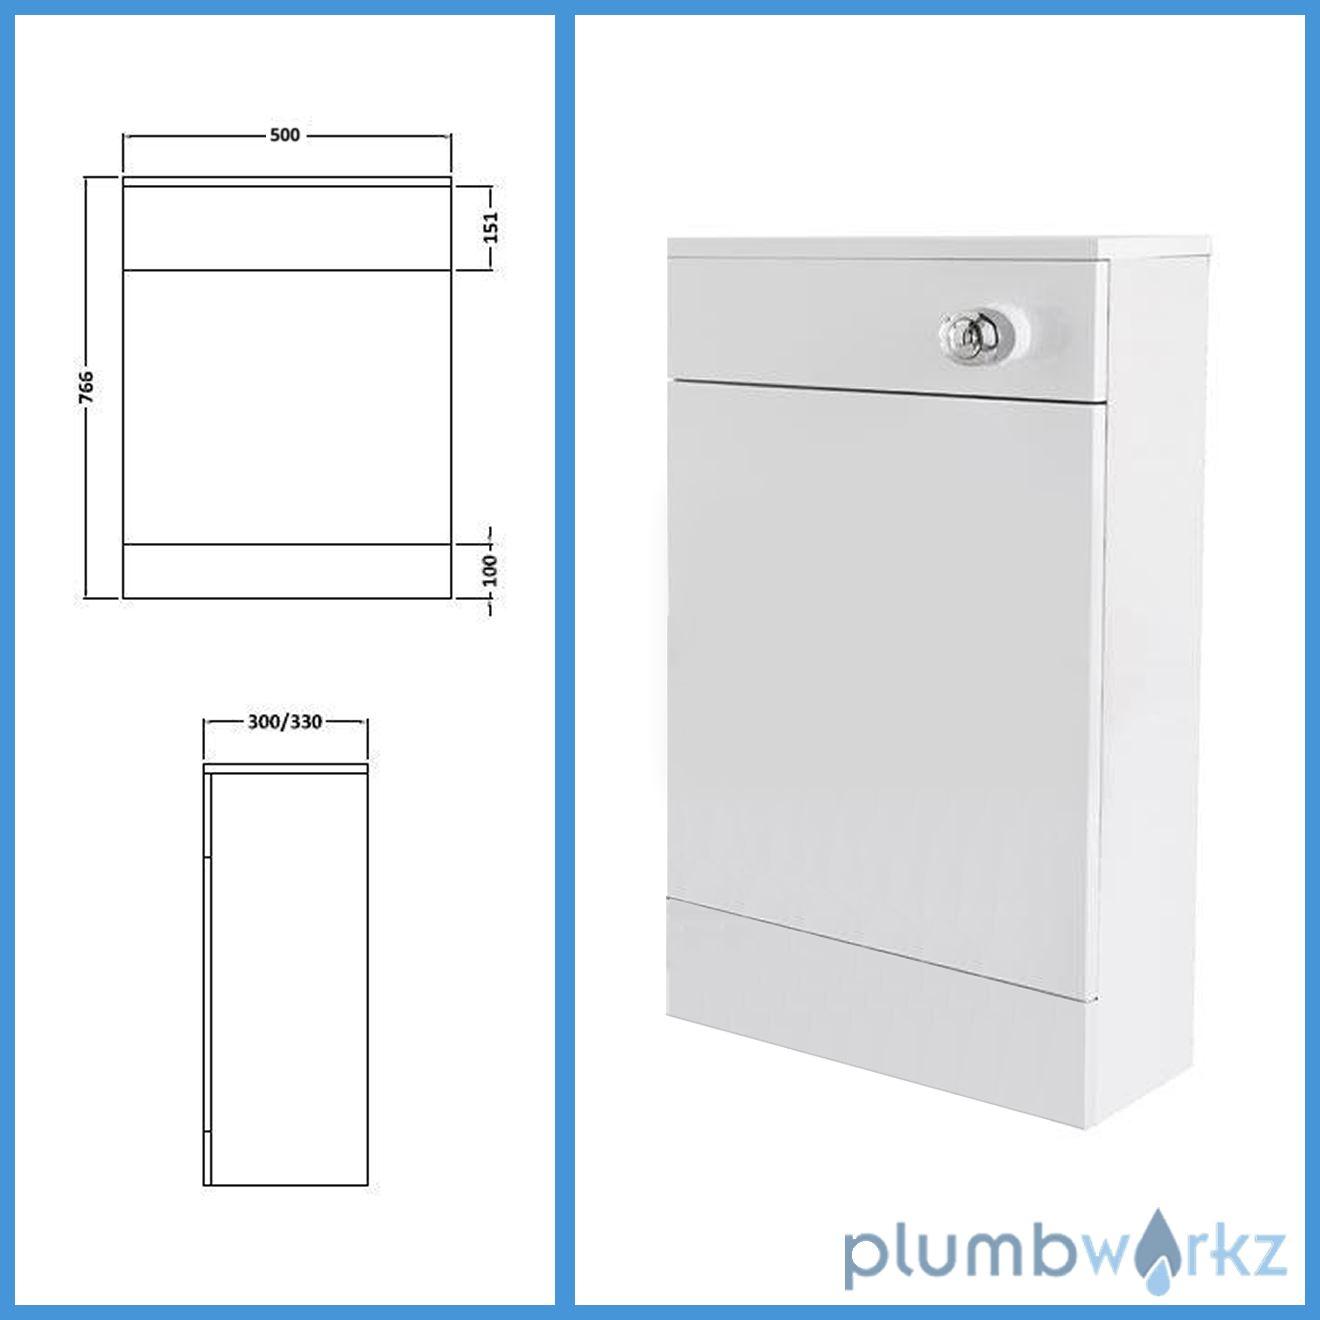 bathroom furniture suite vanity unit cabinet toilet basin back to wall wc unit ebay. Black Bedroom Furniture Sets. Home Design Ideas